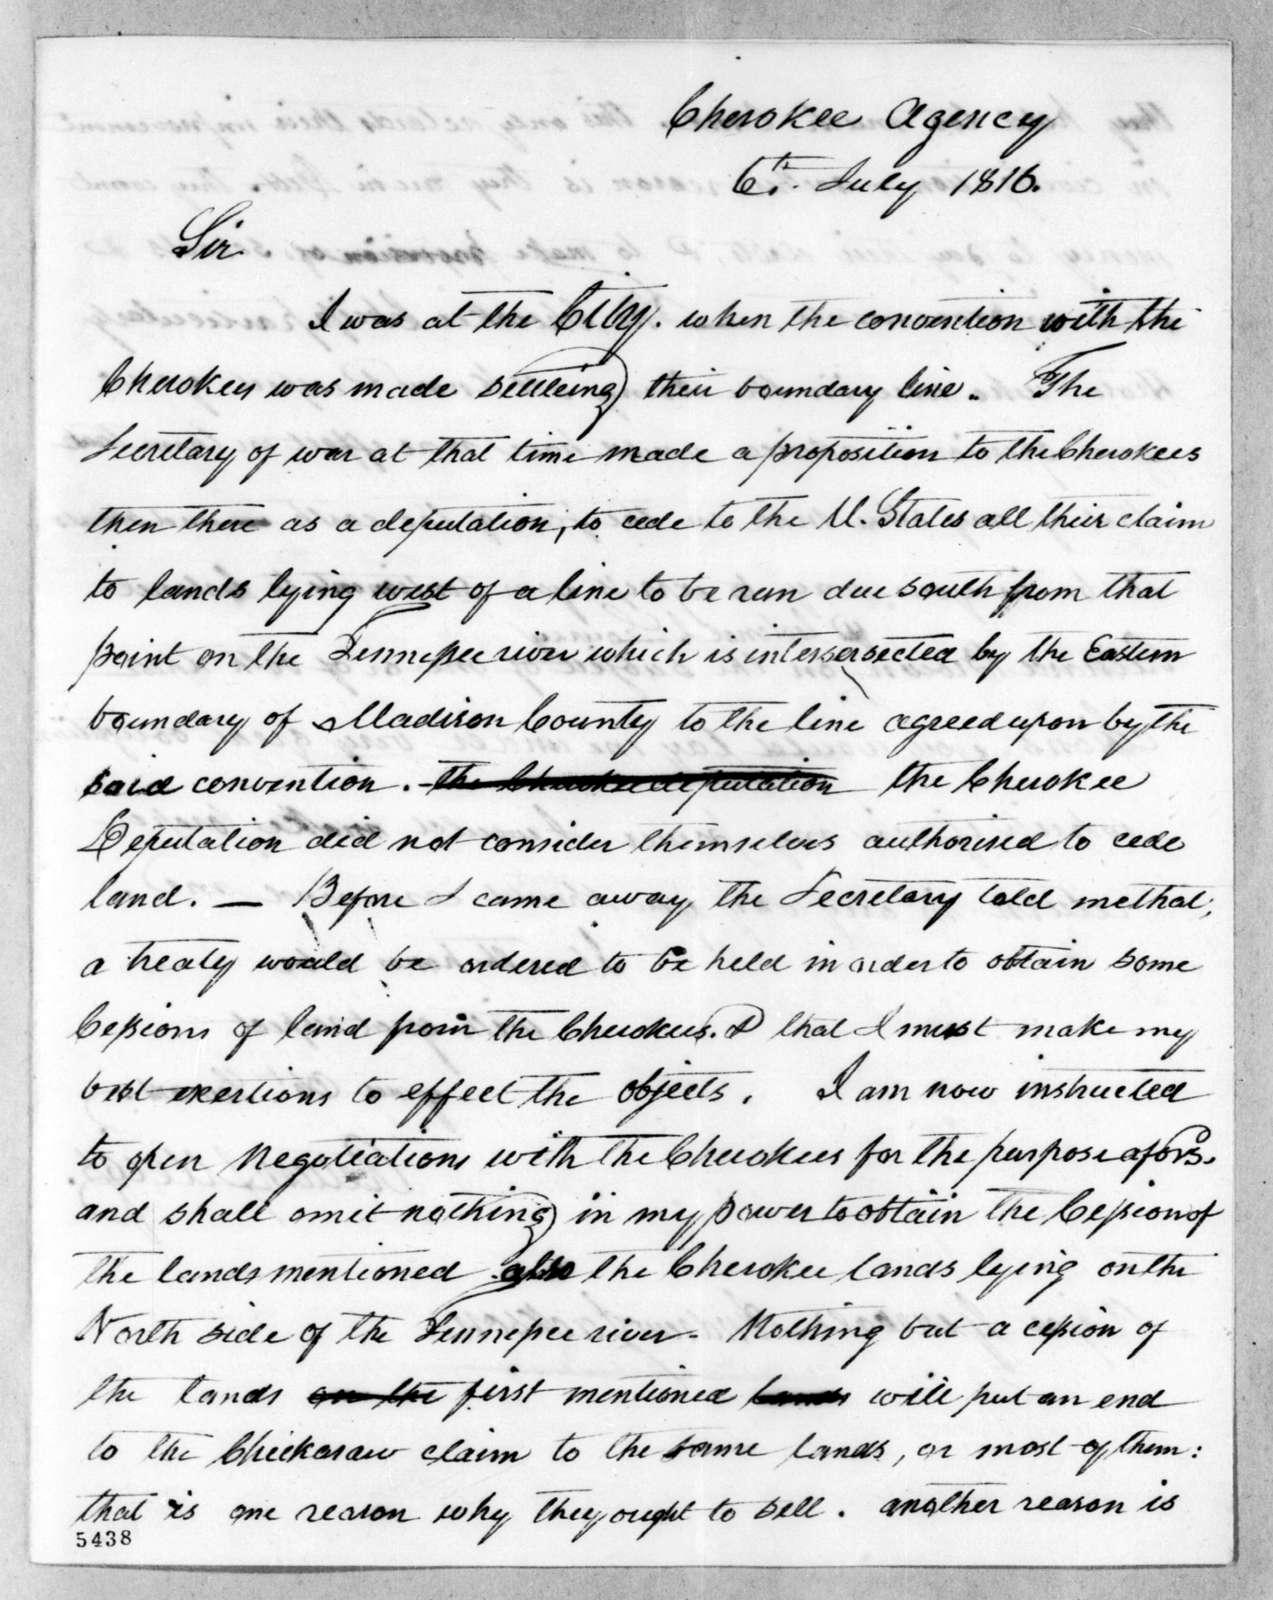 Return Jonathan Meigs to Andrew Jackson, July 6, 1816